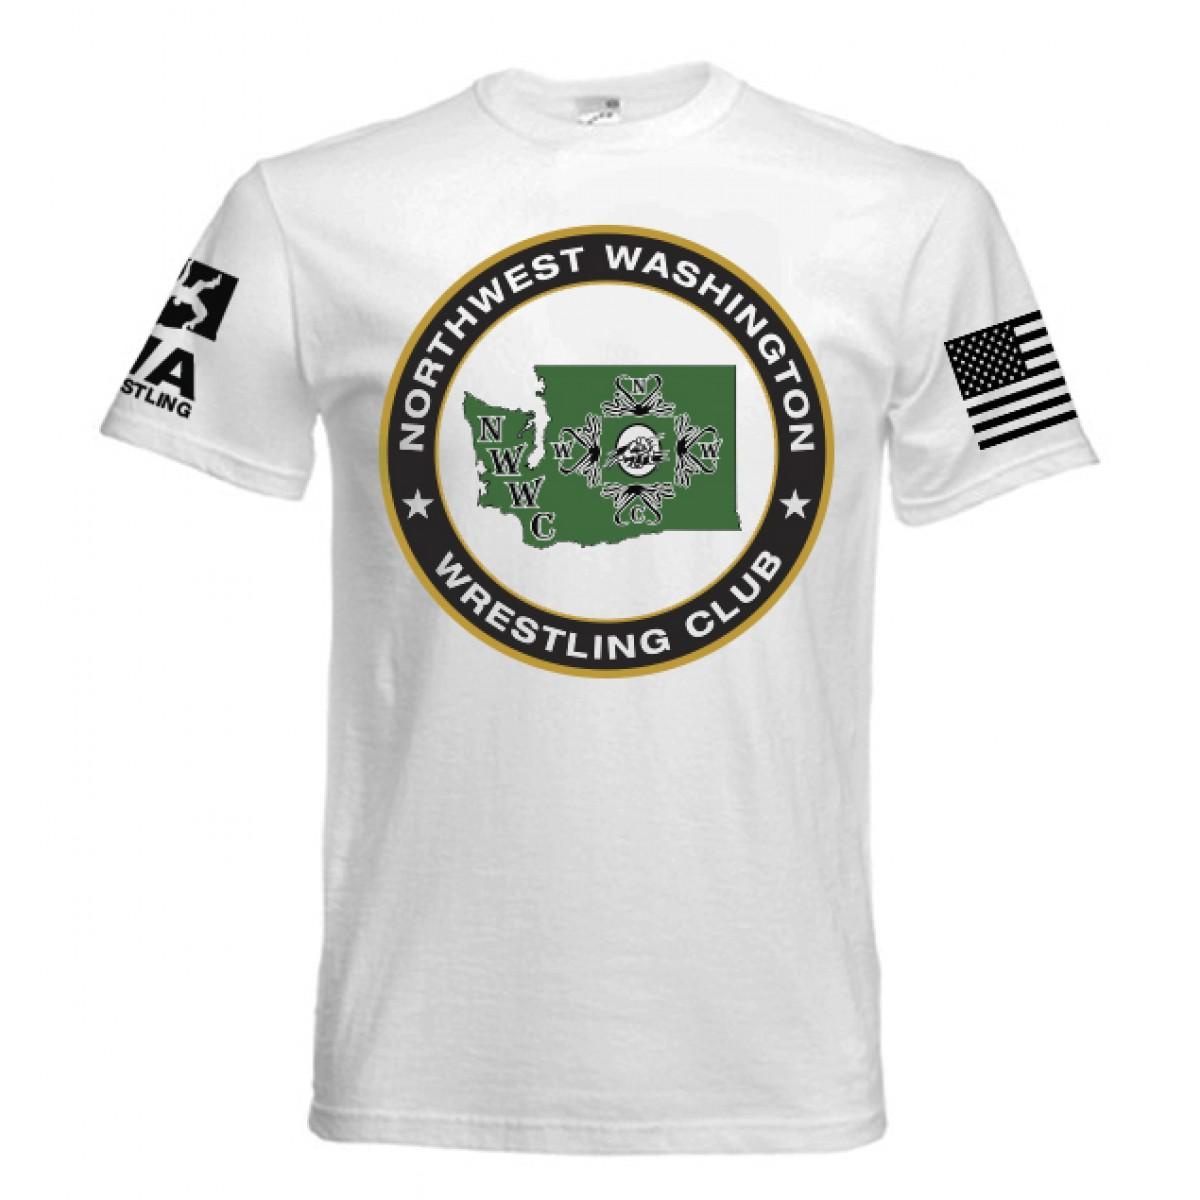 NWWC White T-shirt Green Logo-White-YL